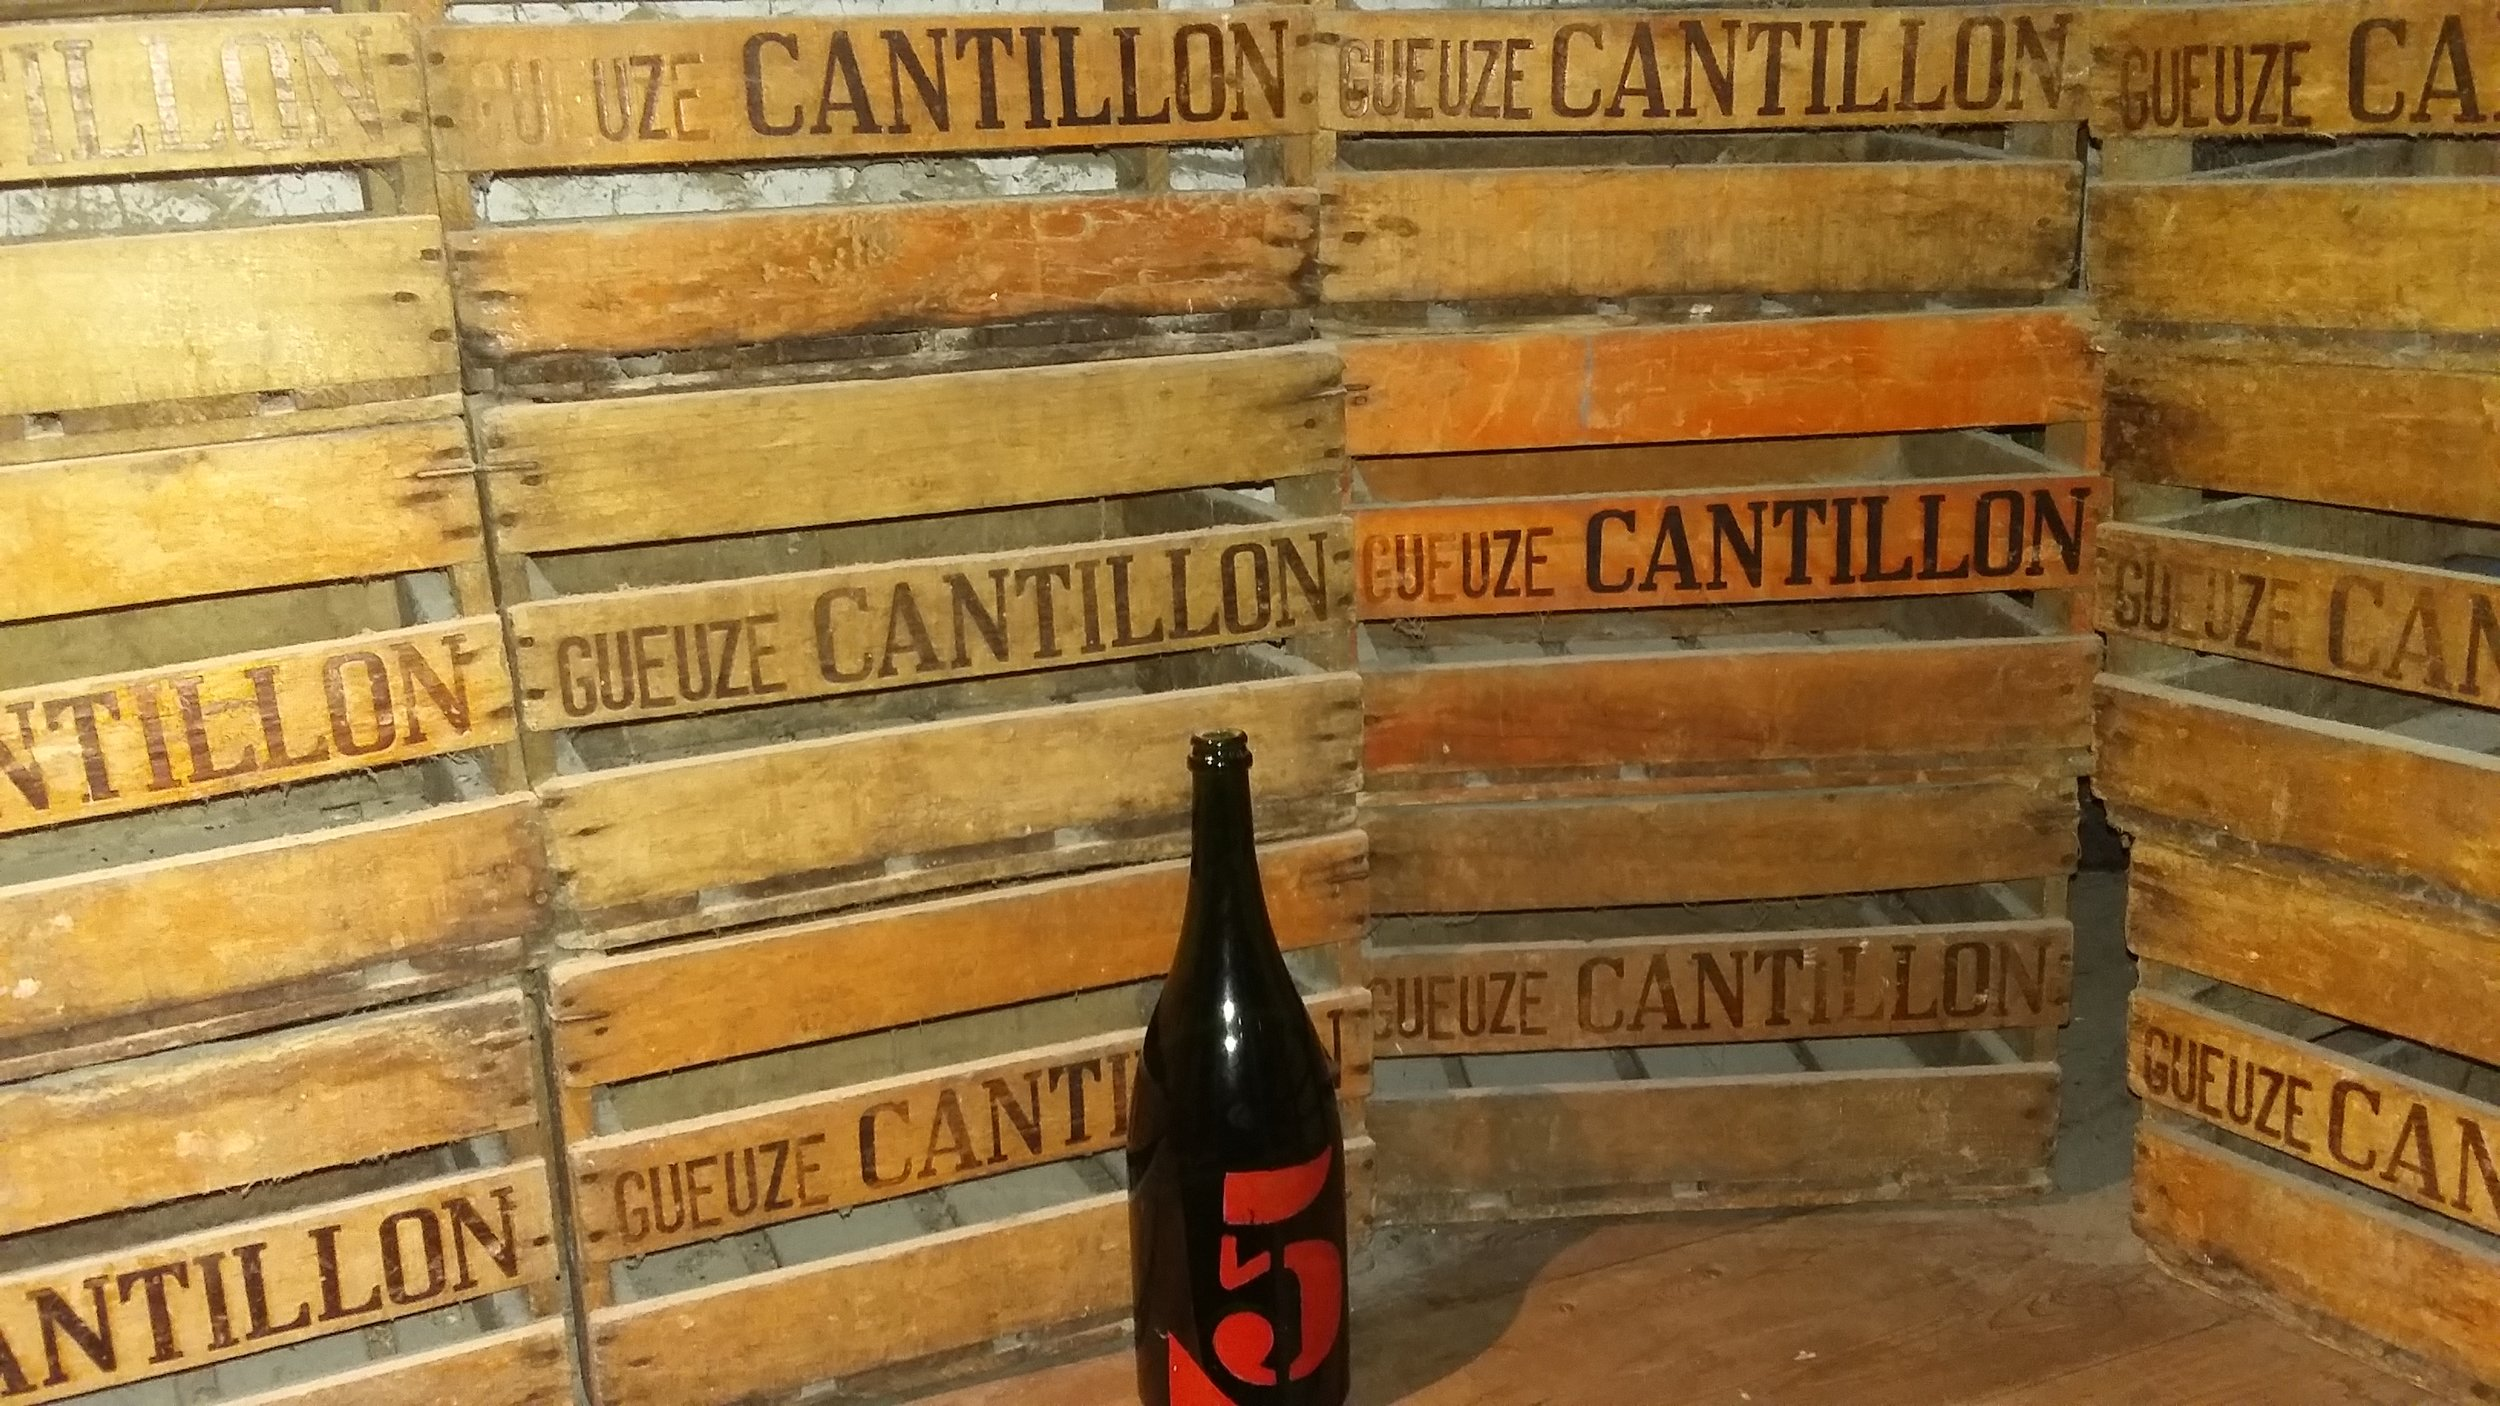 Cantillon_Wooden Crates copy.jpg